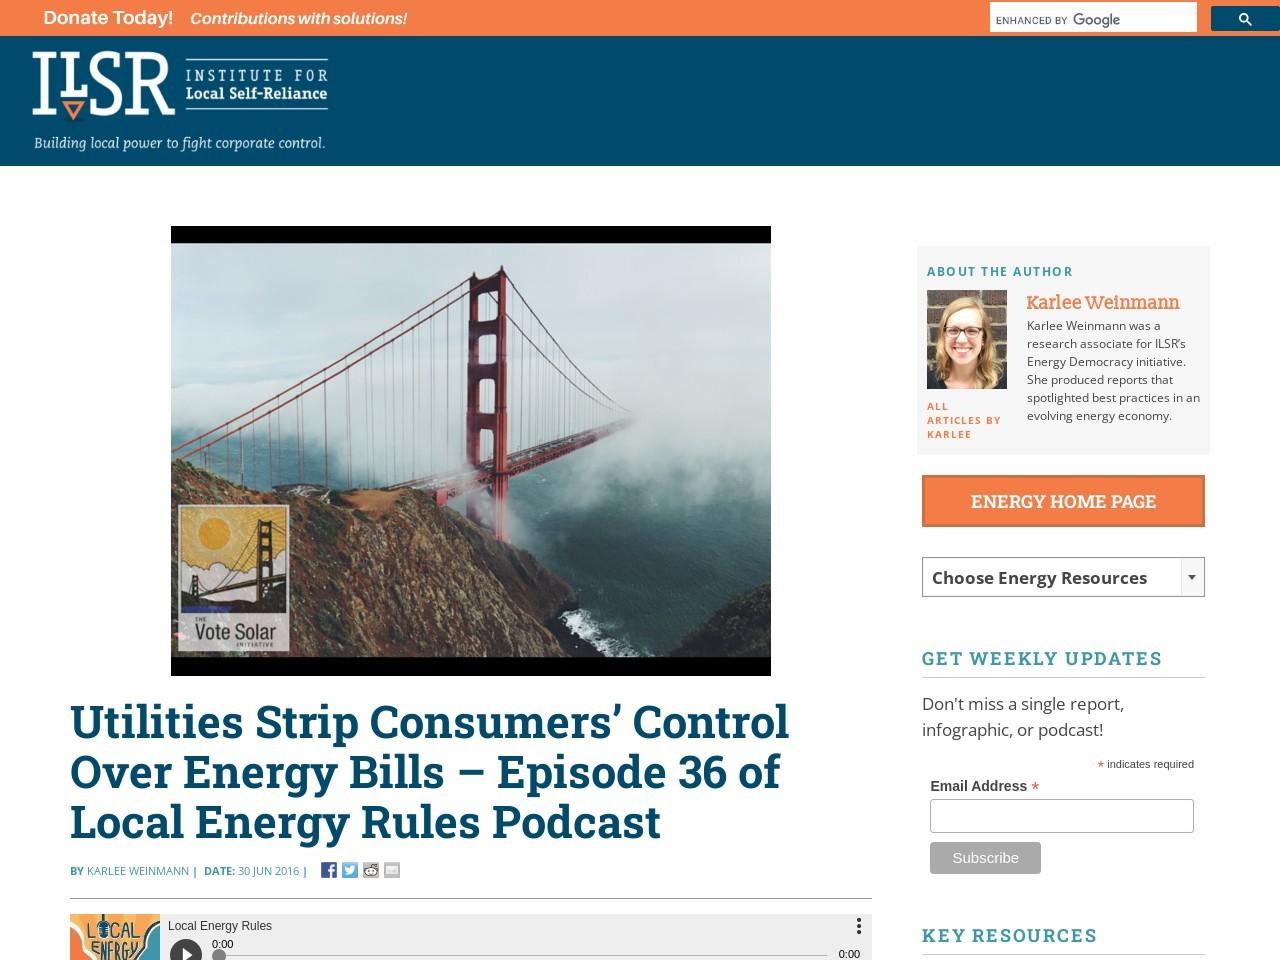 Utilities Strip Consumers' Control Over Energy Bills